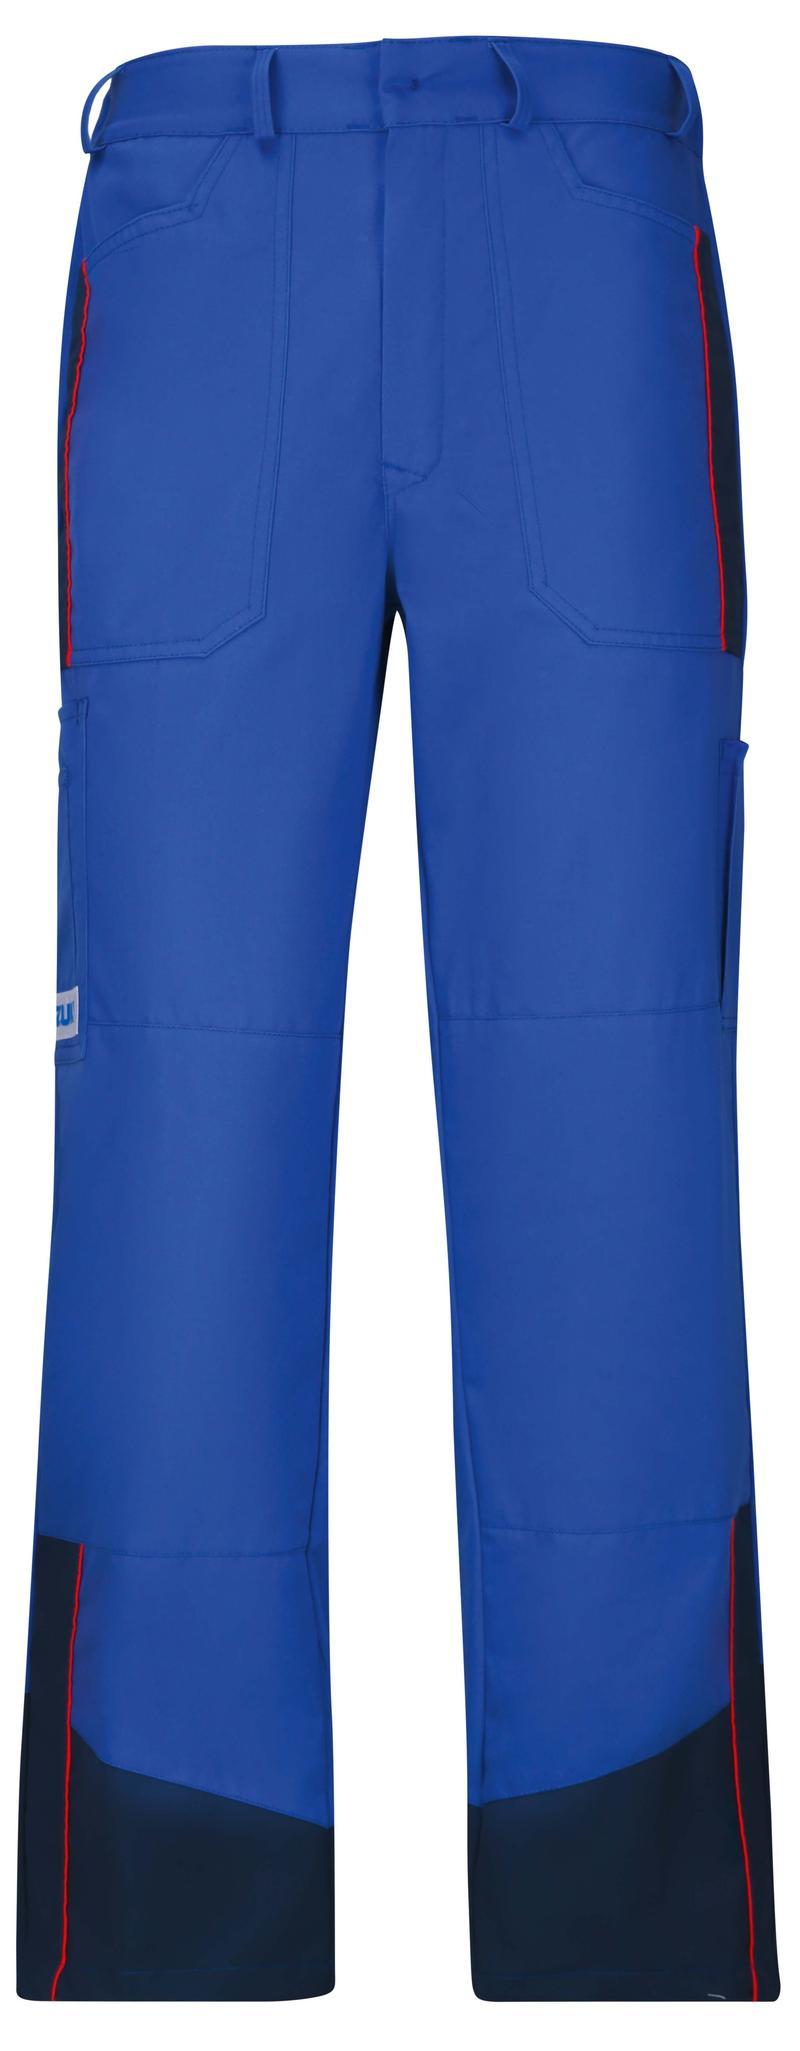 Workshop Trousers